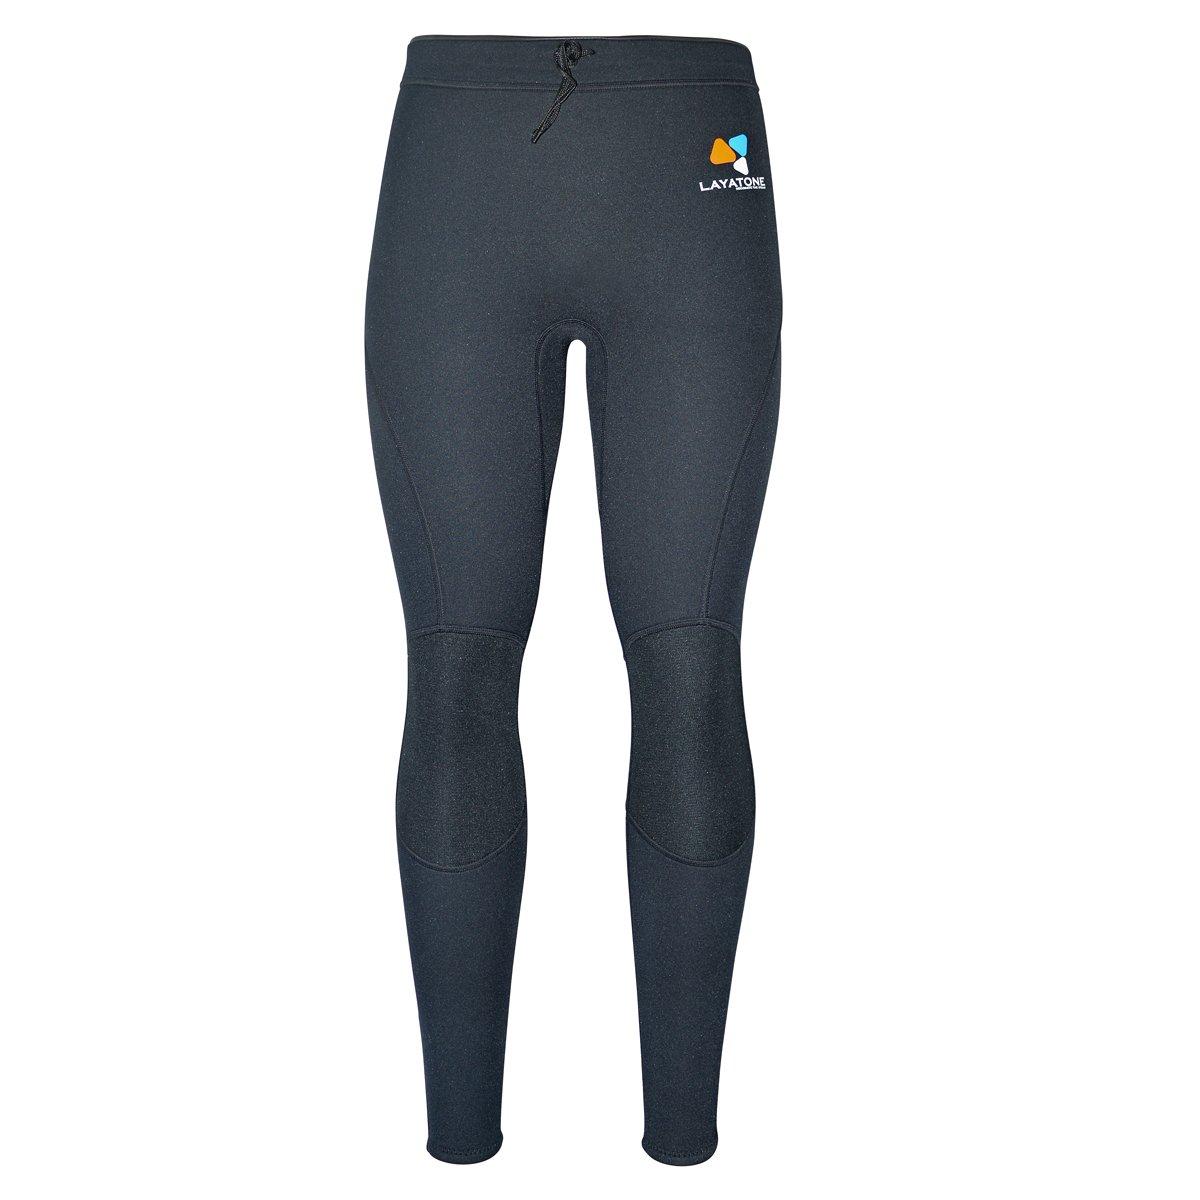 Layatone Wetsuit Pants Men Women Premium 2mm Neoprene Pants Surfing Snorkeling Canoeing Swimming Spearfishing Suit Pants Women Men Adults UV Protection Wet Suits Men Women by Layatone